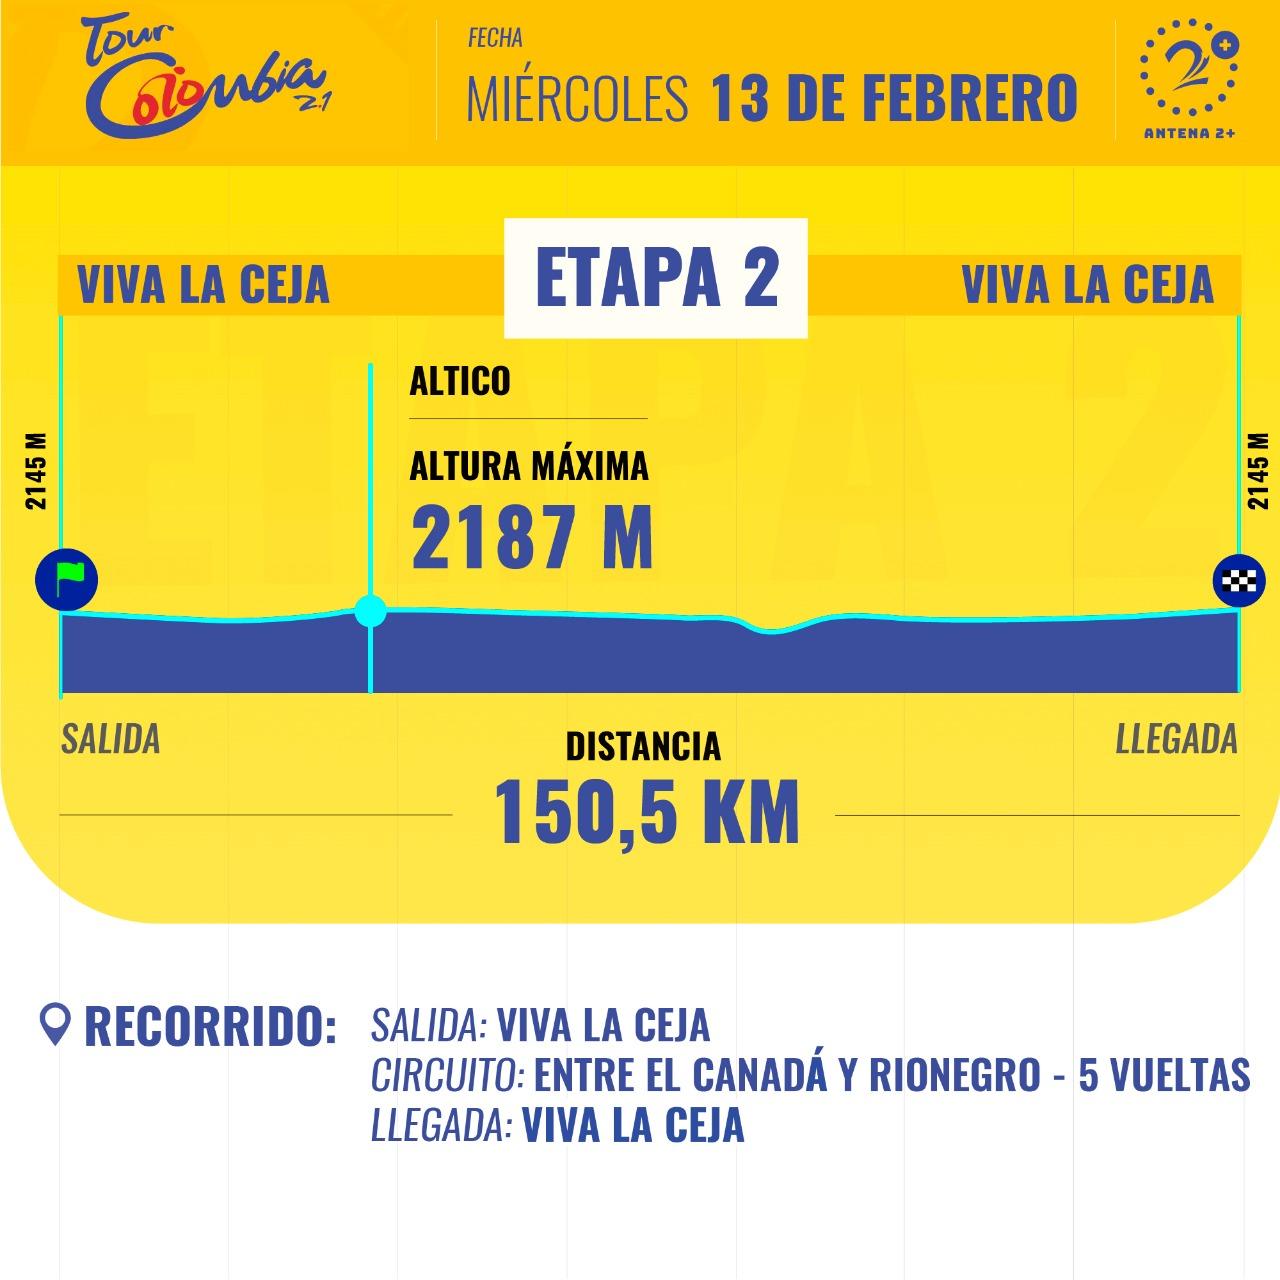 Tour Colombia 2.1 - Segunda etapa Antena 2